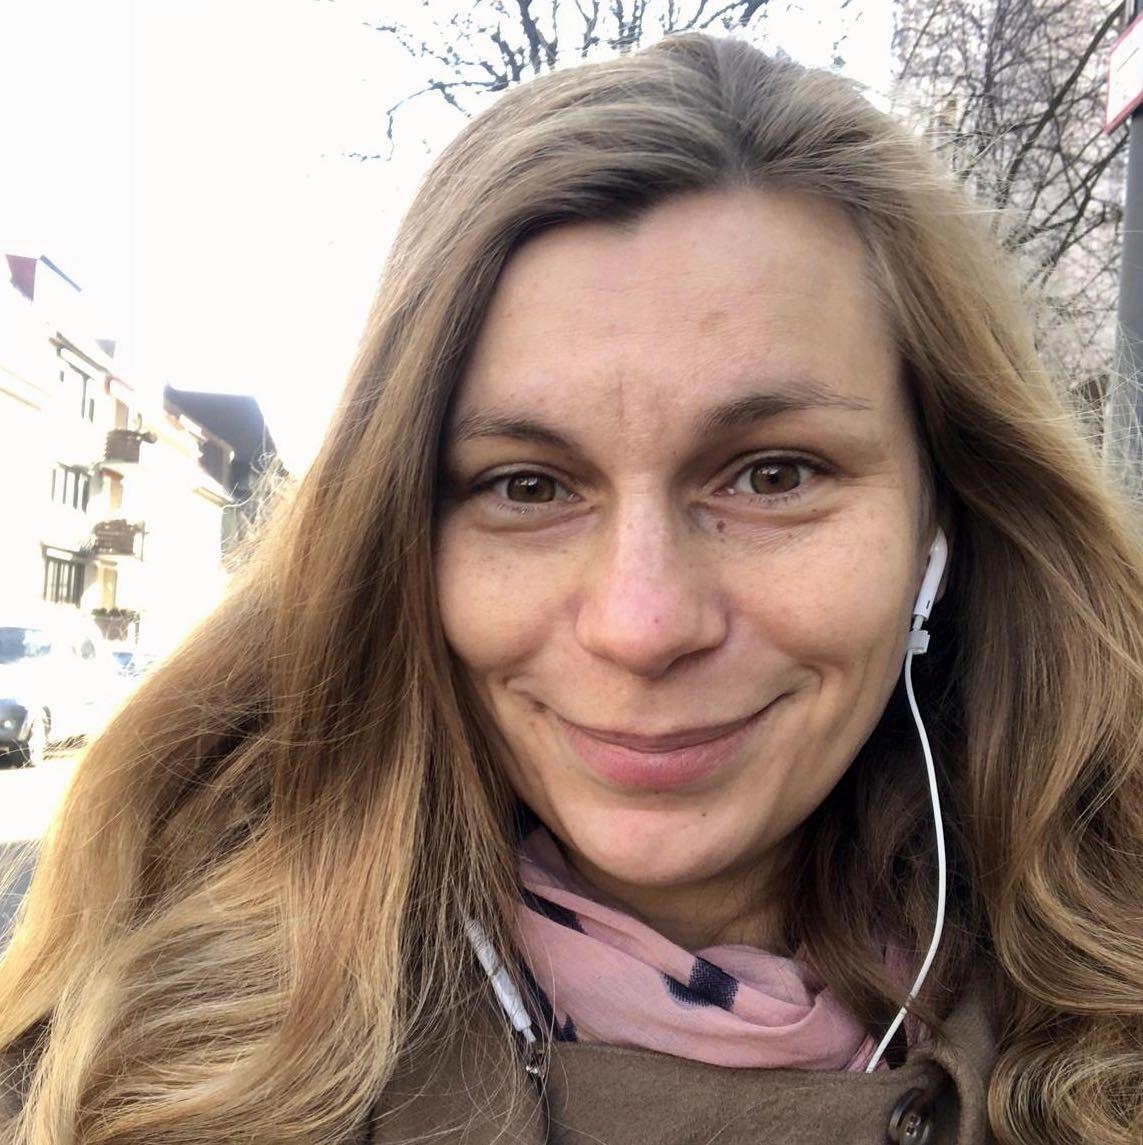 Friederike Baudisch vom FRÜF-Podcast